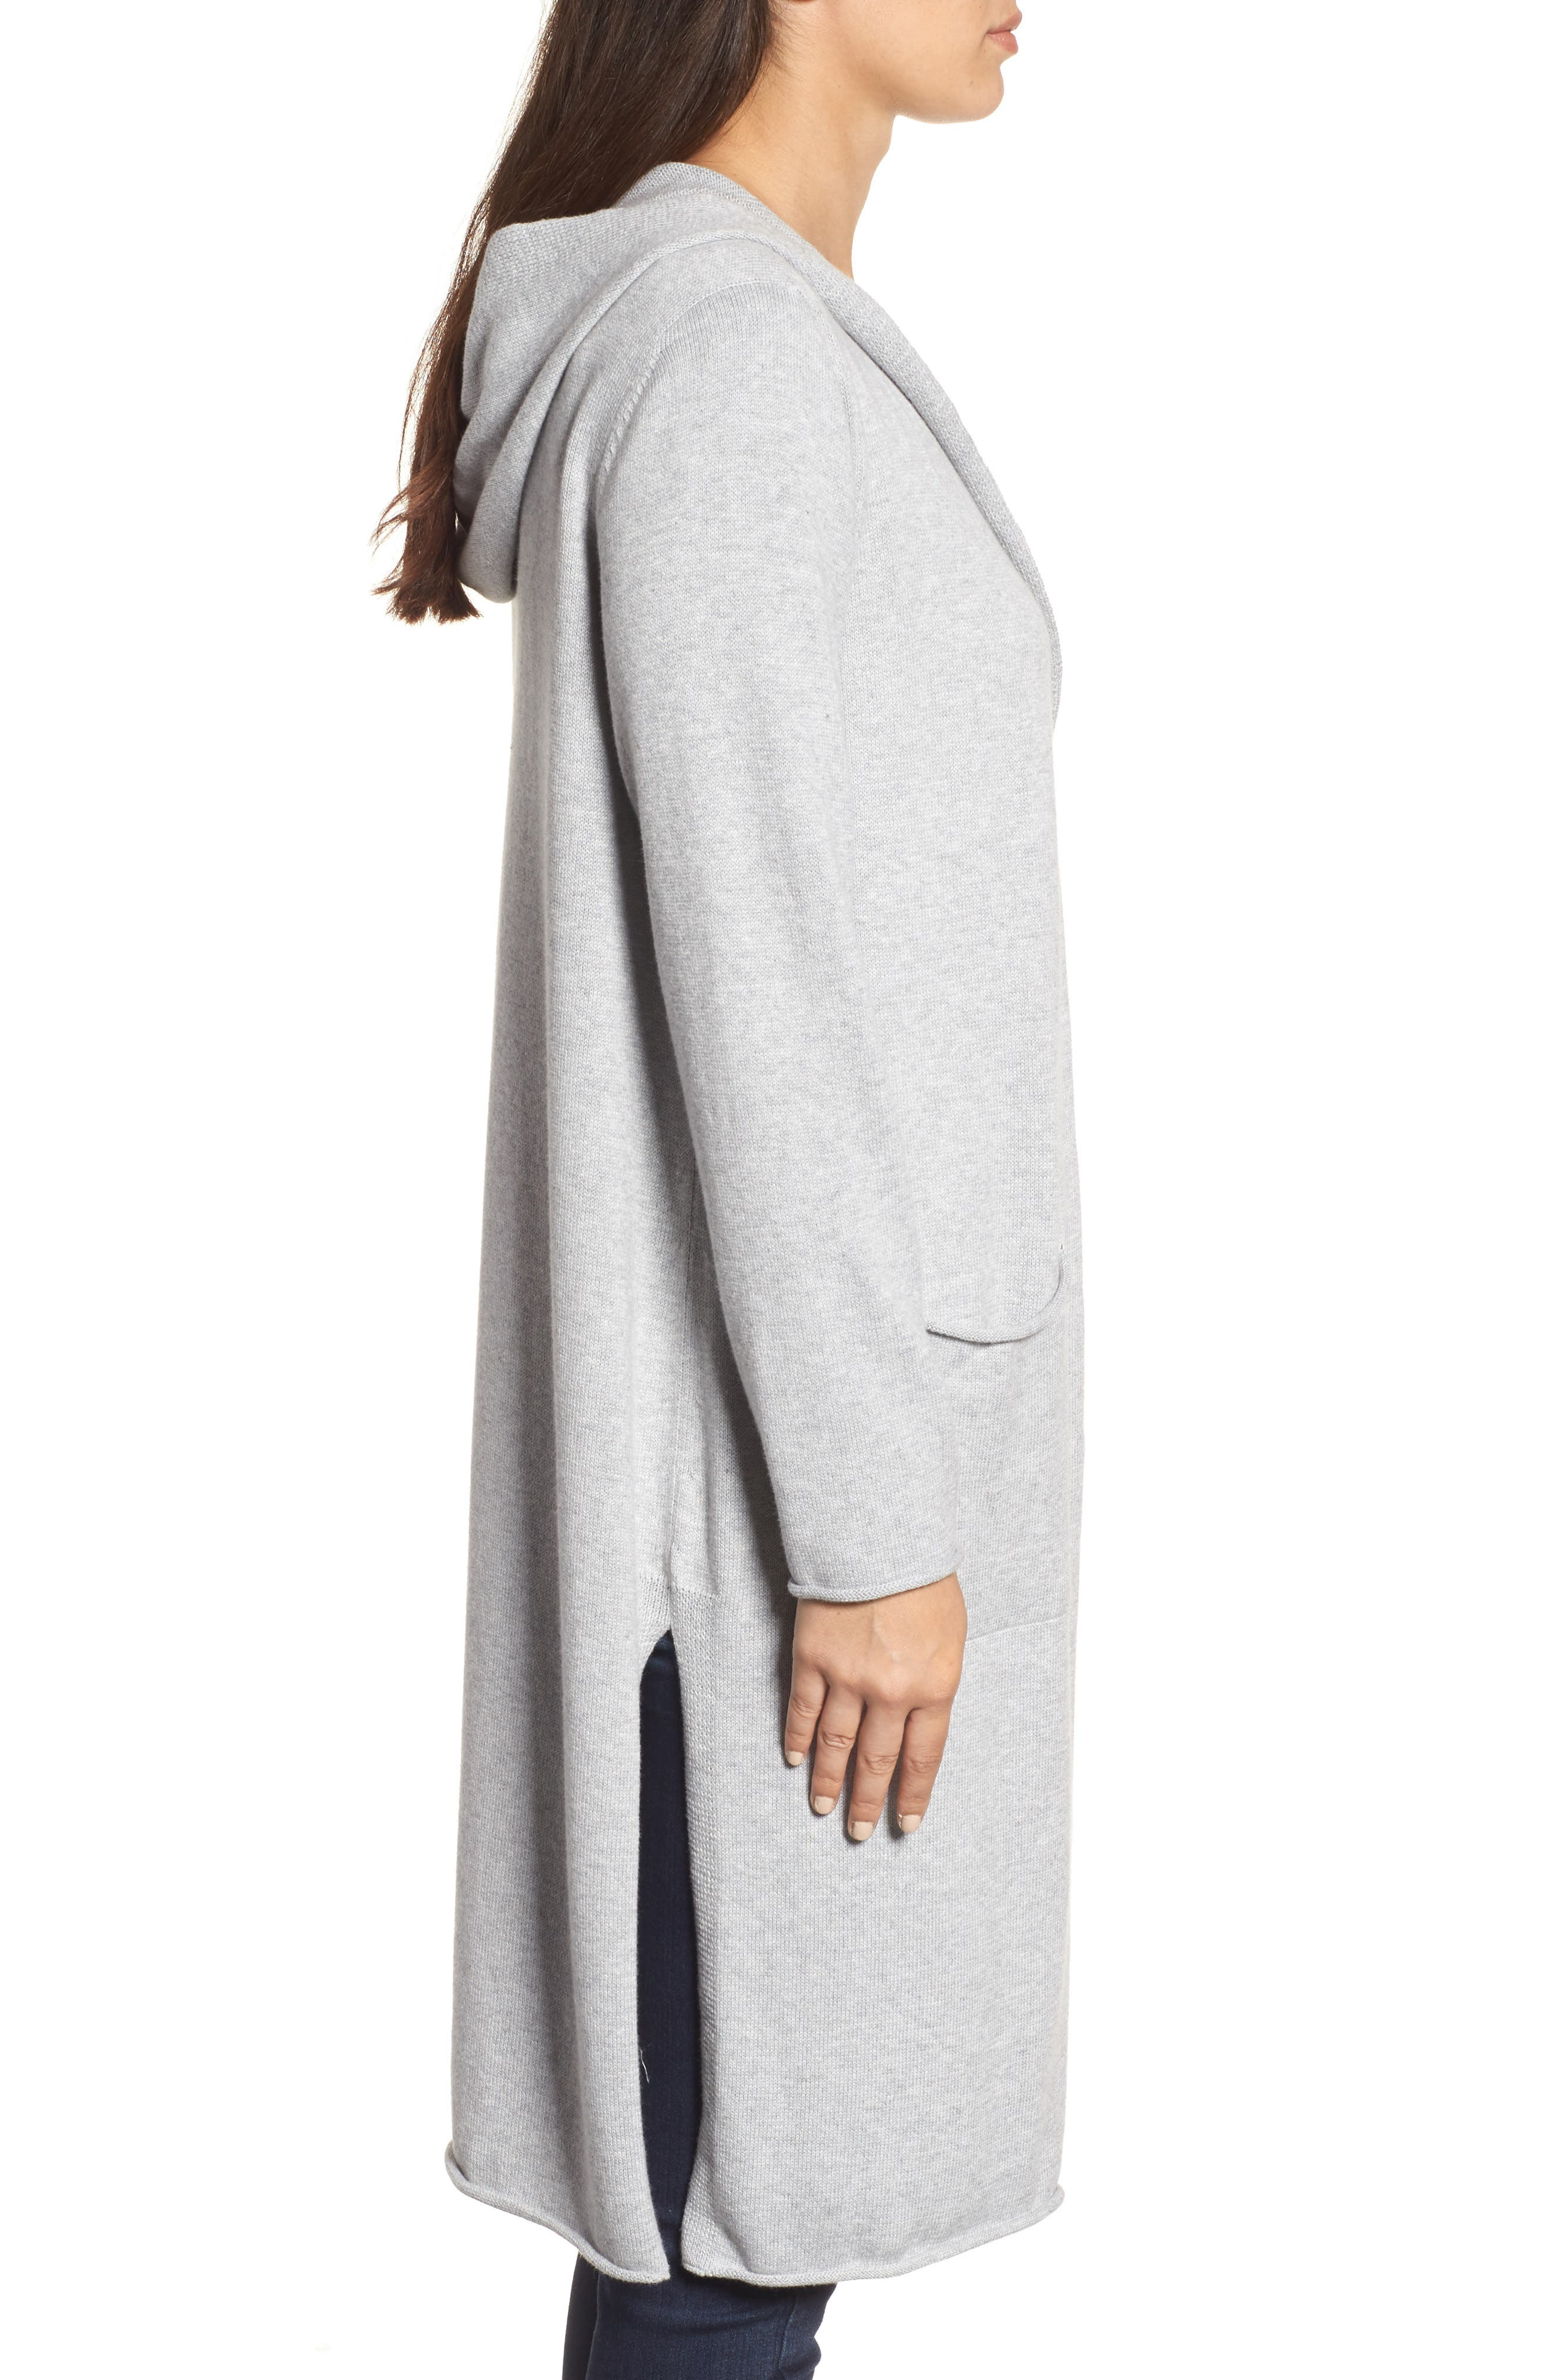 Organic Cotton Hooded Cardigan,                             Alternate thumbnail 3, color,                             022